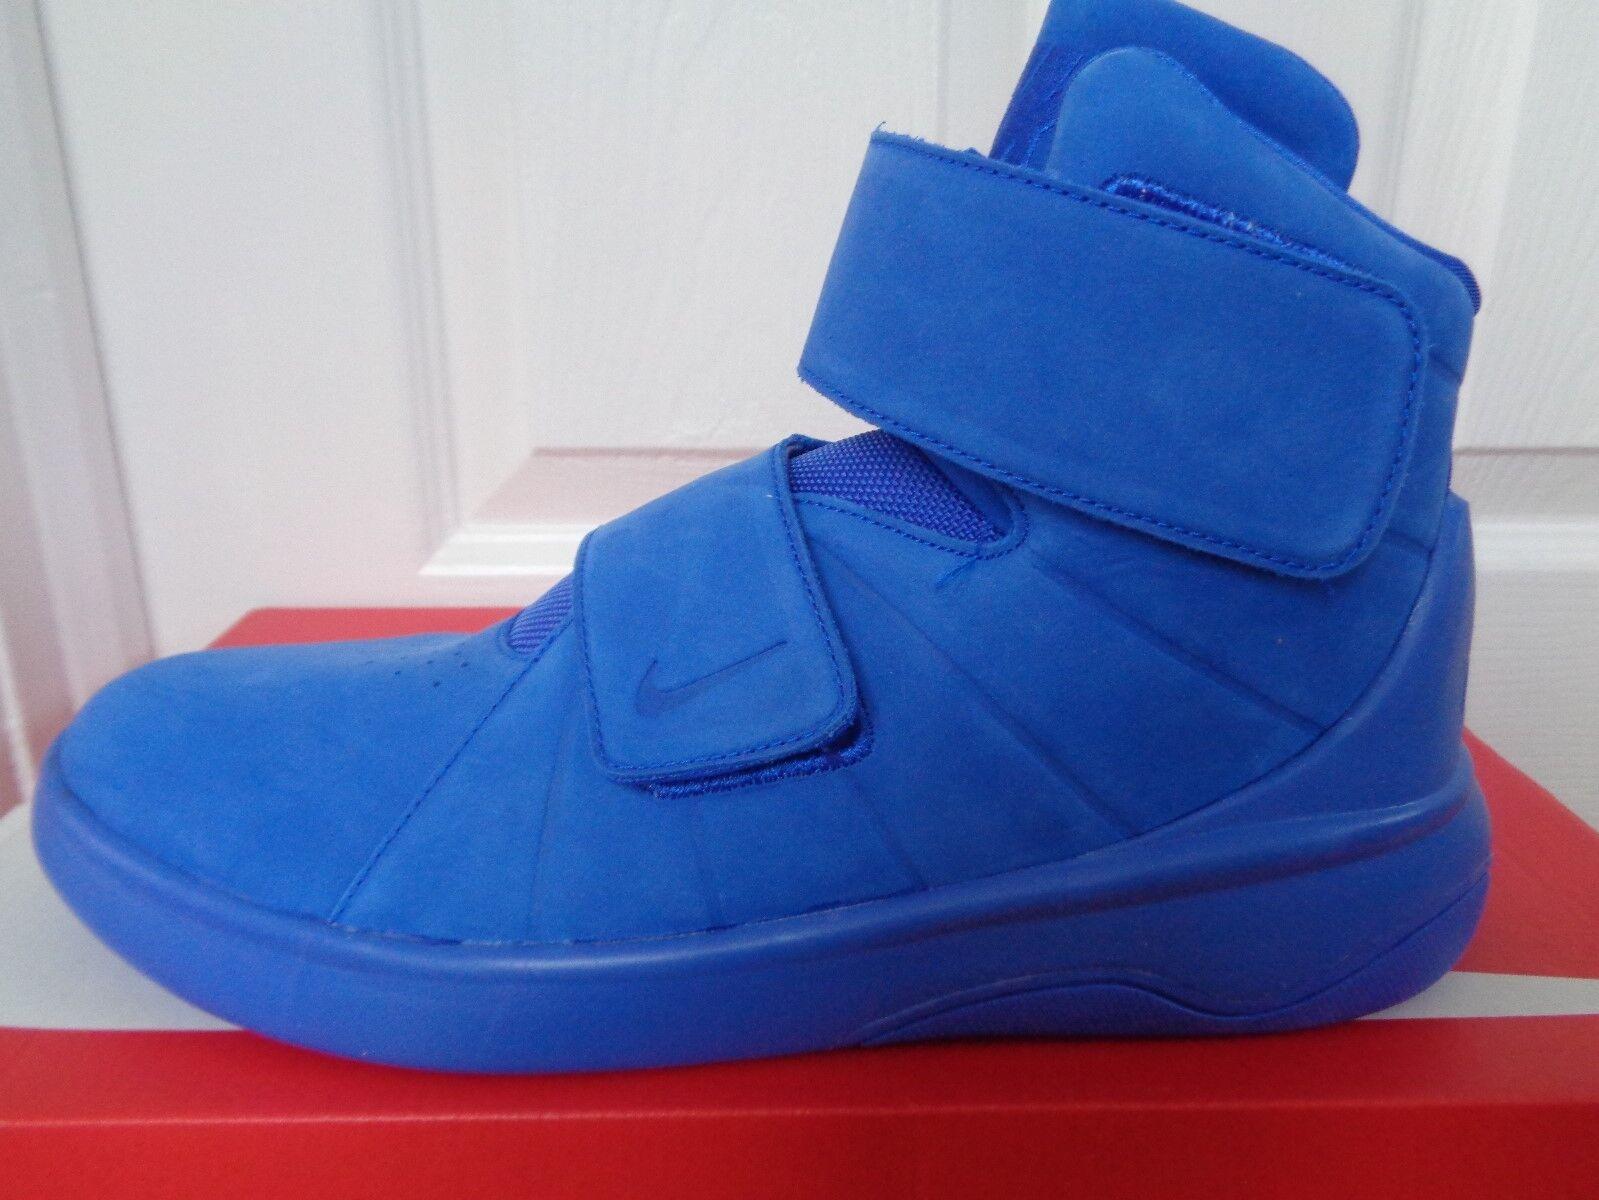 Nike marxman Sneakerboot Prm da uomo 832766 400 EU 43 US 9.5 Nuovo + Scatola